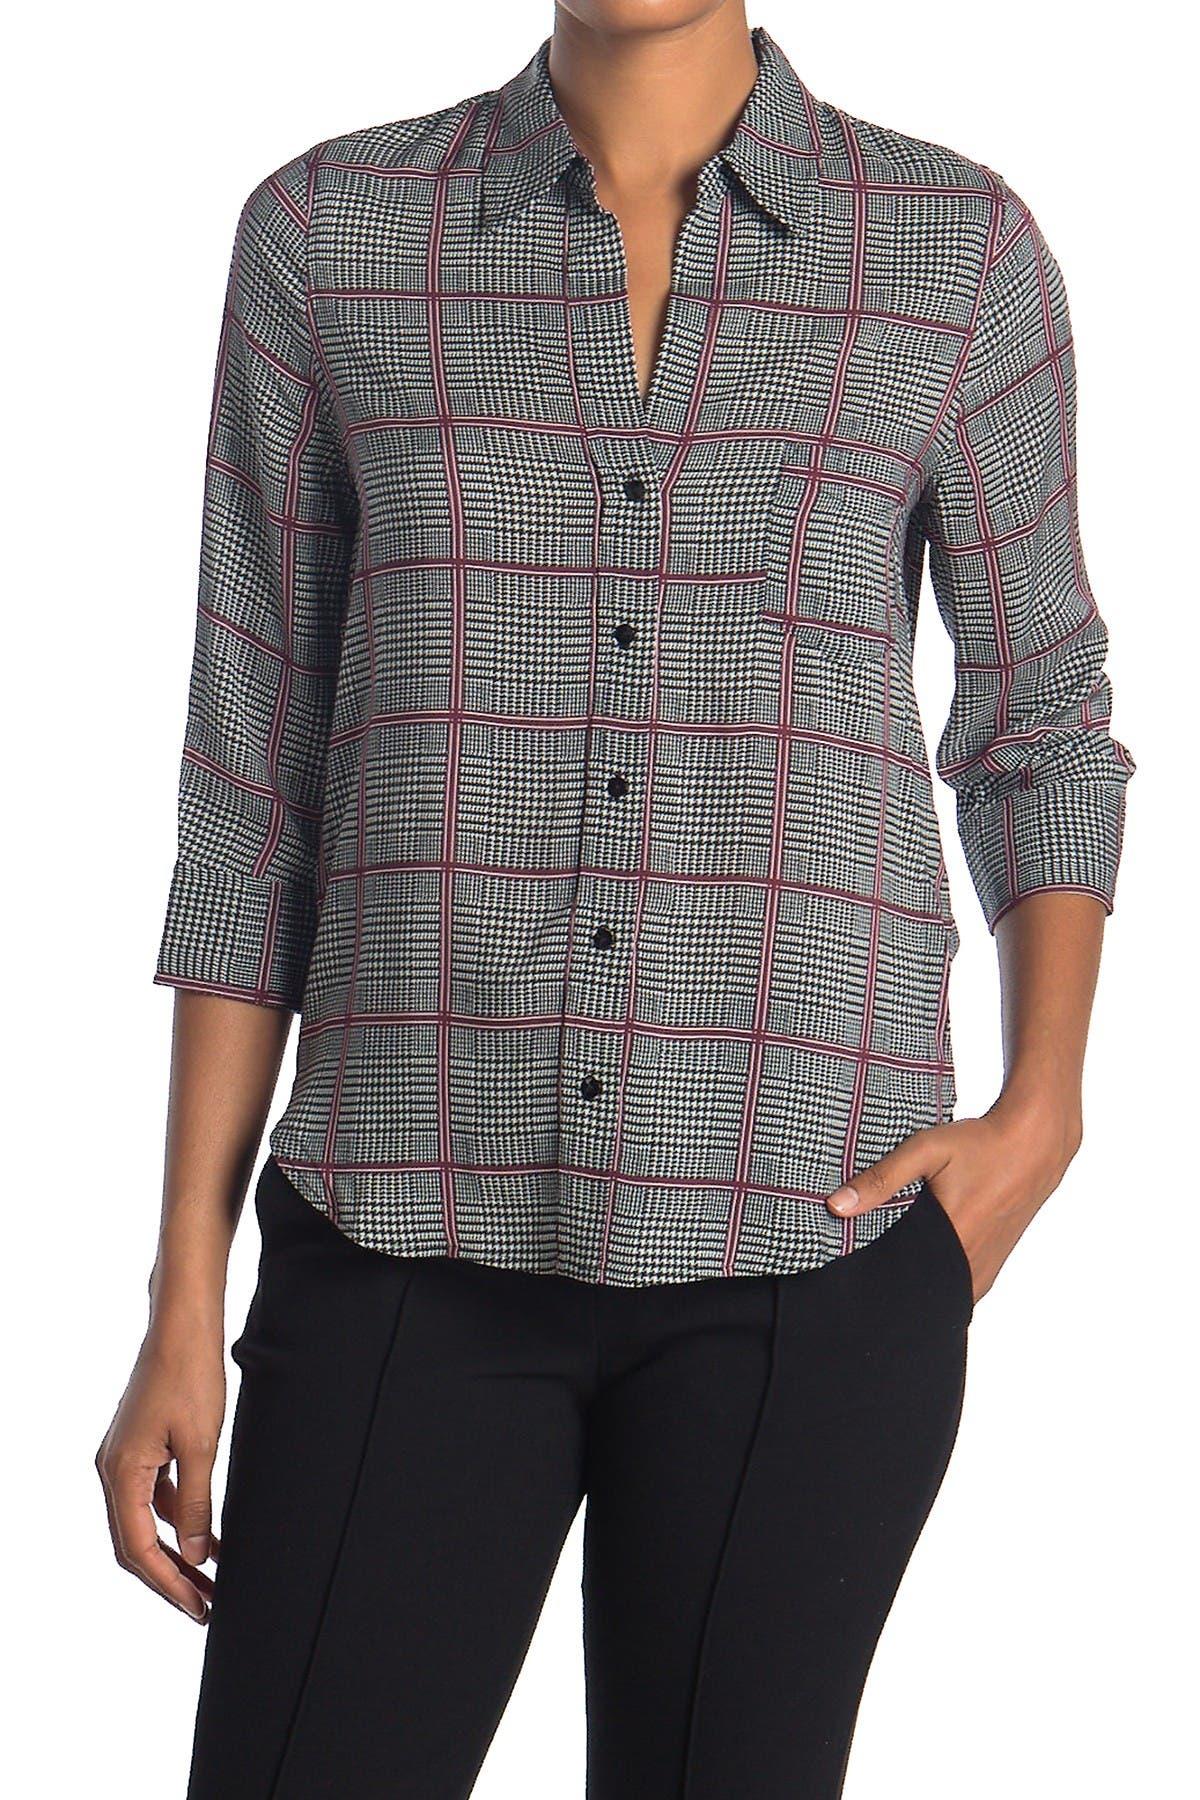 Image of L'AGENCE Ryan Windowpane Print Shirt